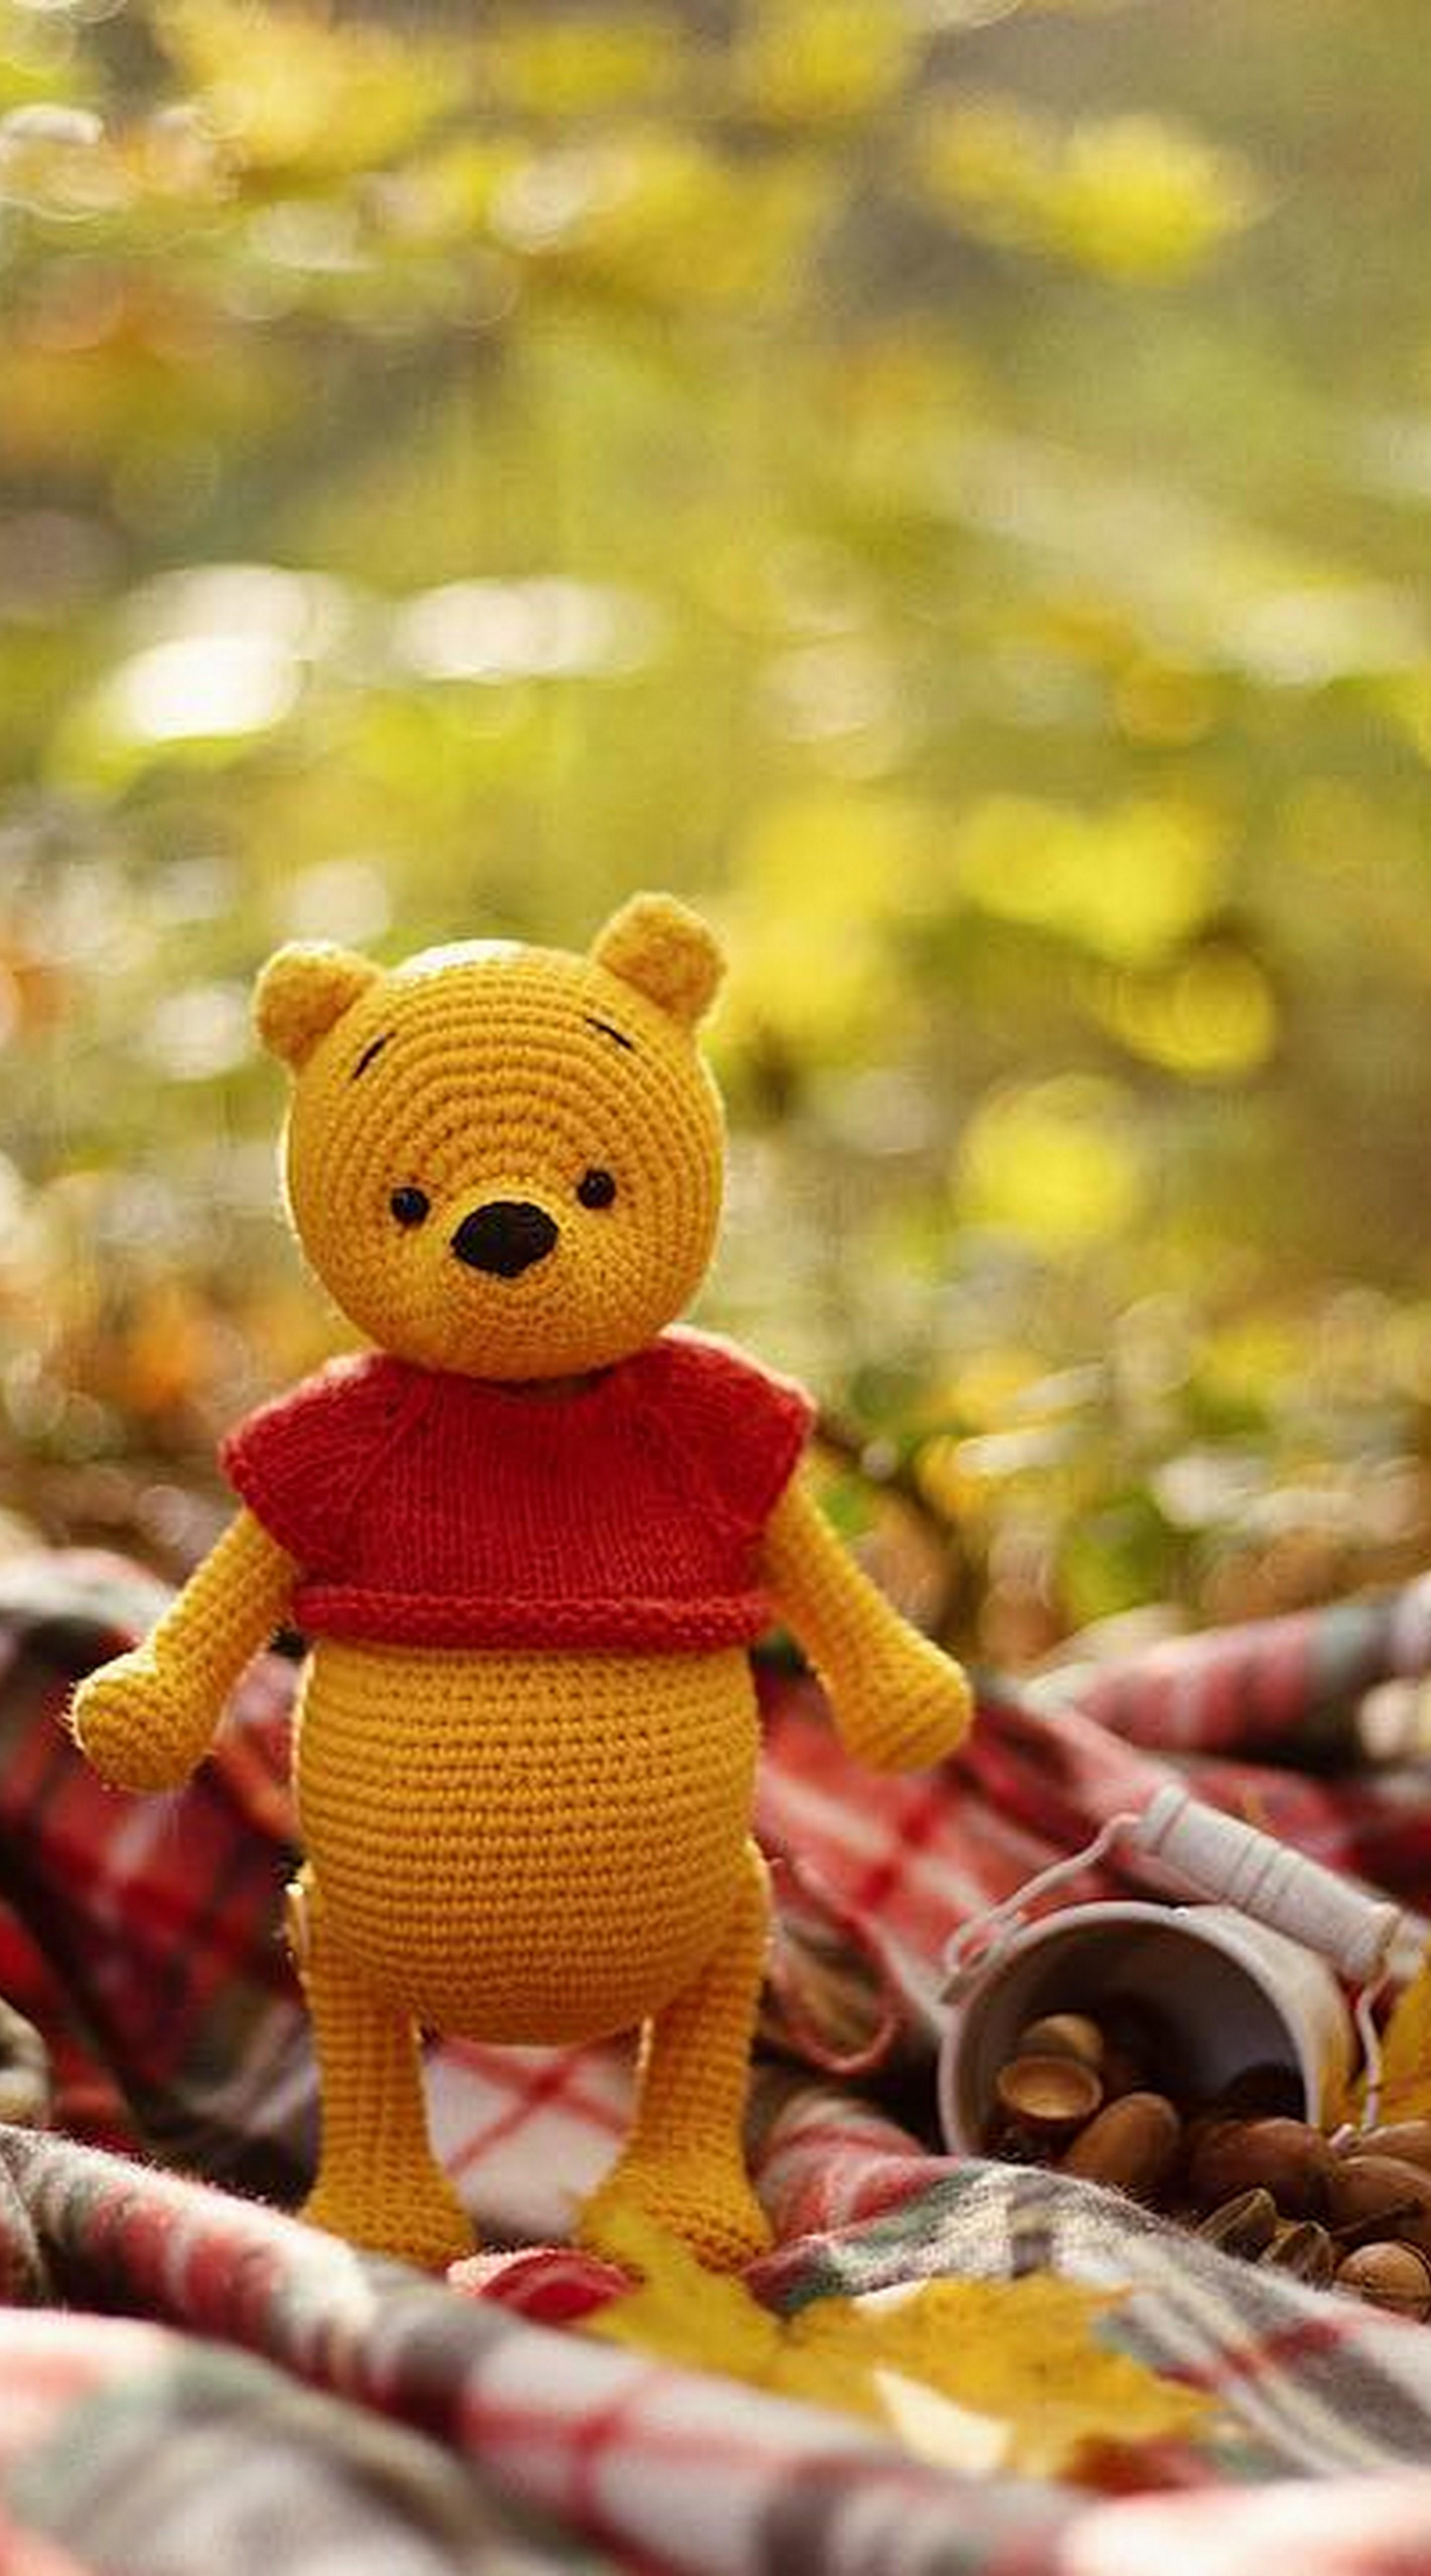 20 Best Amigurumi Doll and Animal Crochet Free Patterns